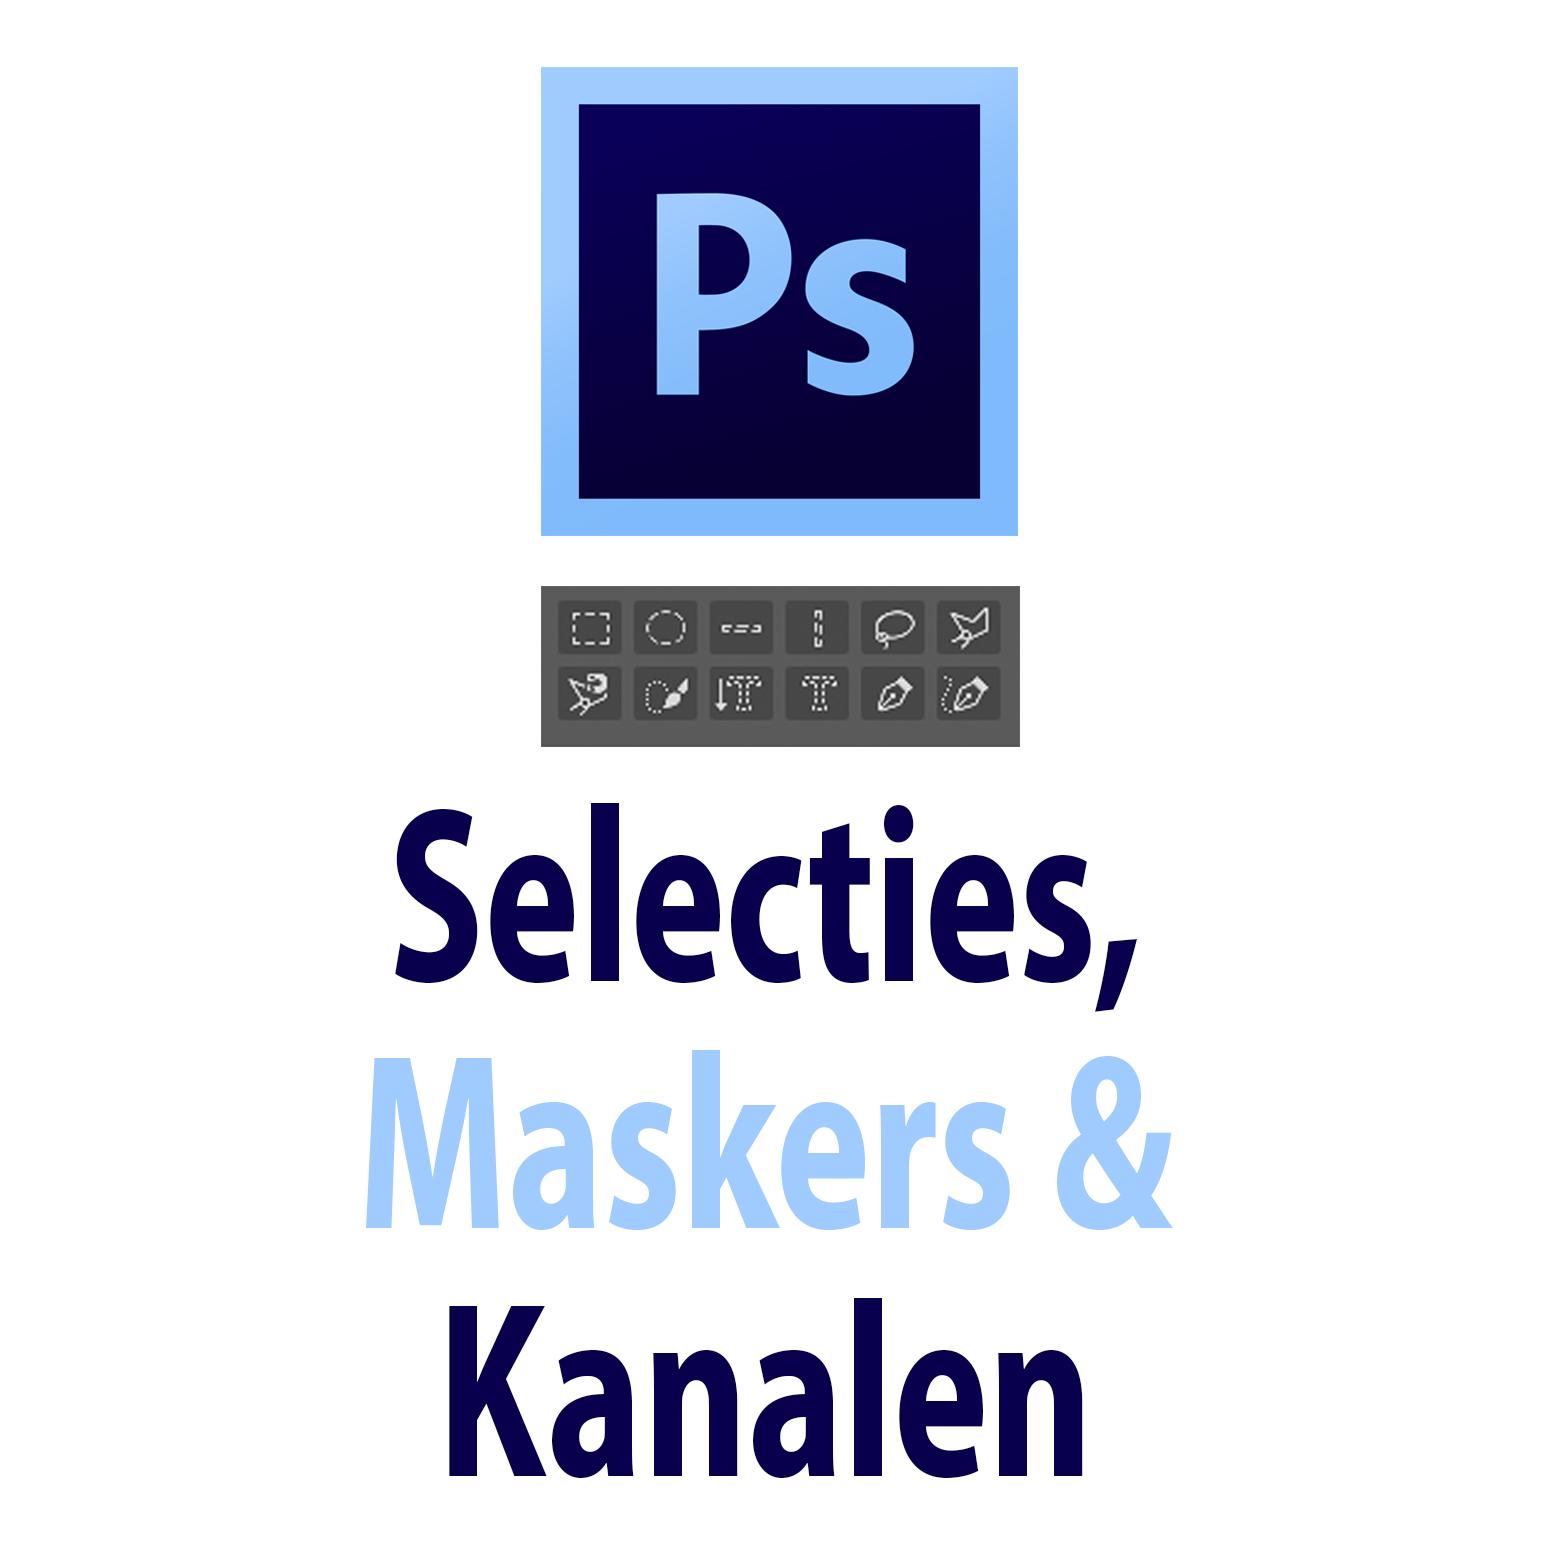 SelectiesMaskersKanalen.jpg